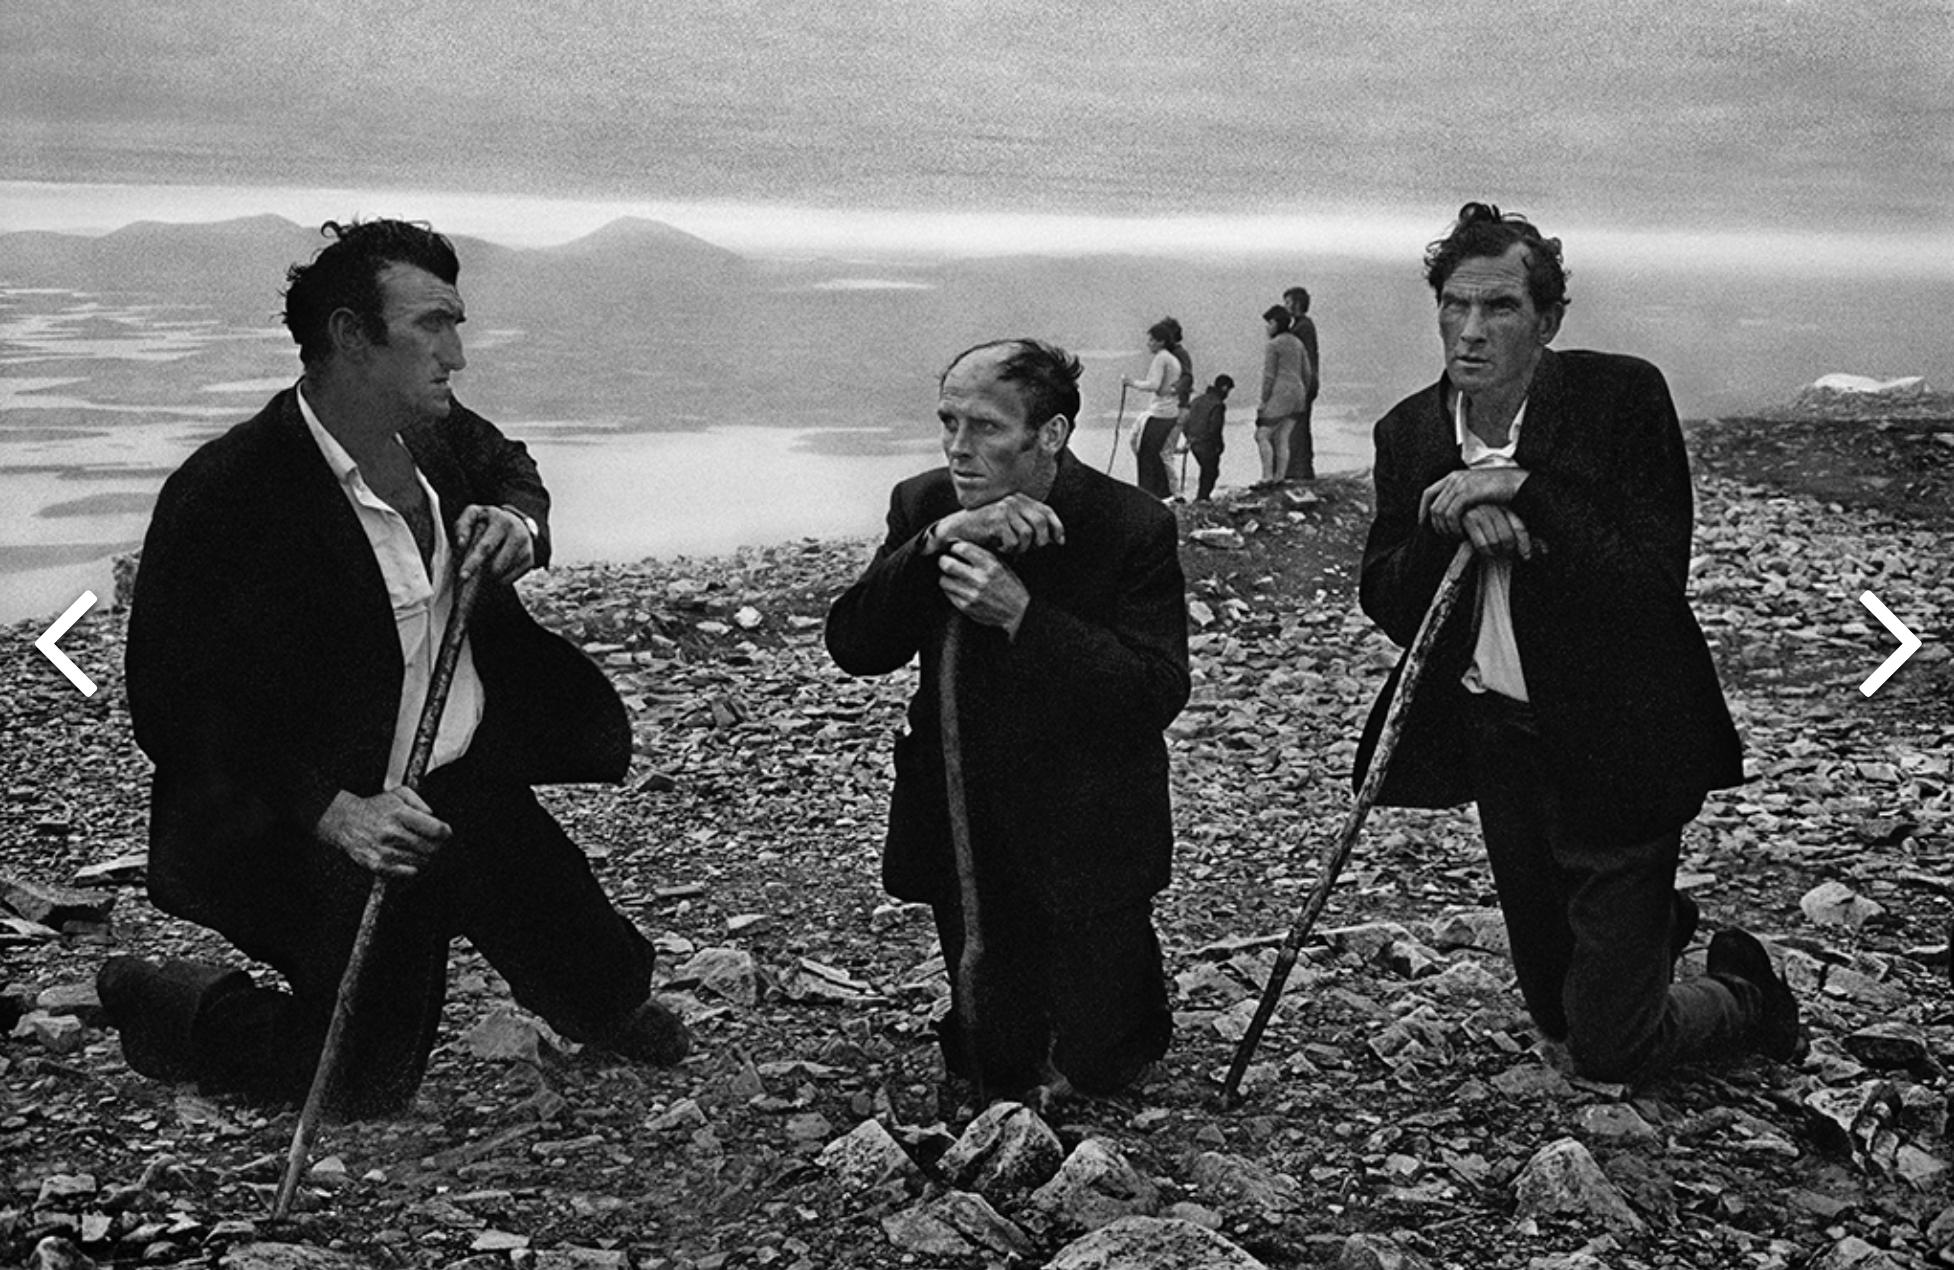 Magnum Photographer Josef Koudelka's Focused On Gypsies